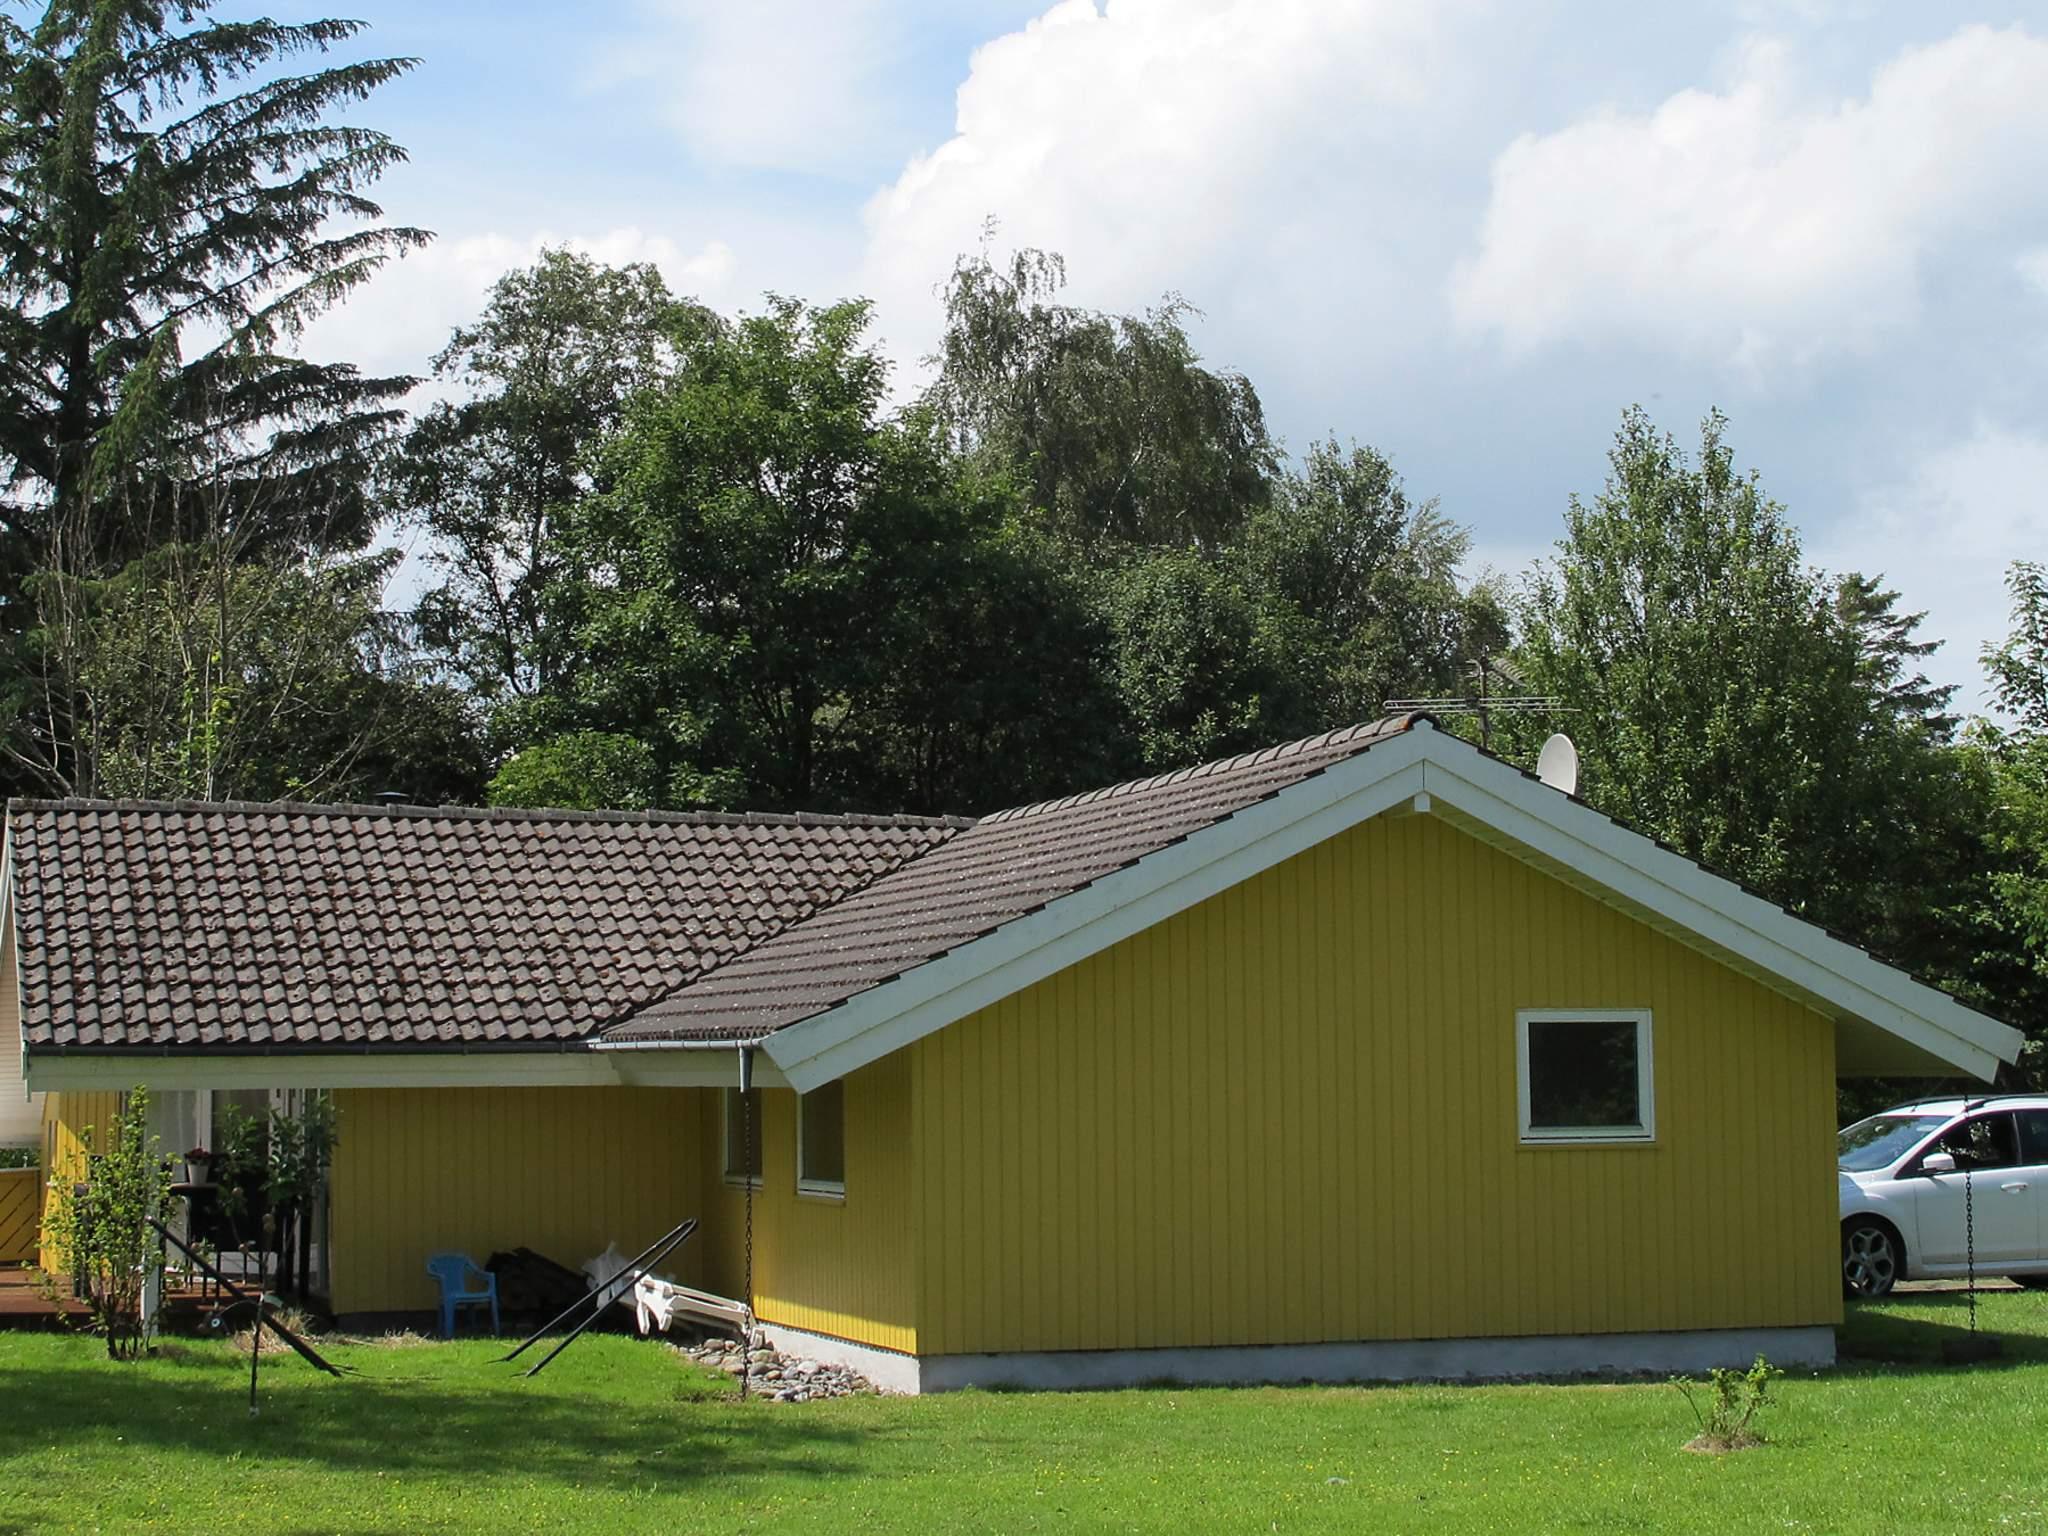 Ferienhaus Råbylille Strand (87316), Råbylille, , Møn, Dänemark, Bild 16